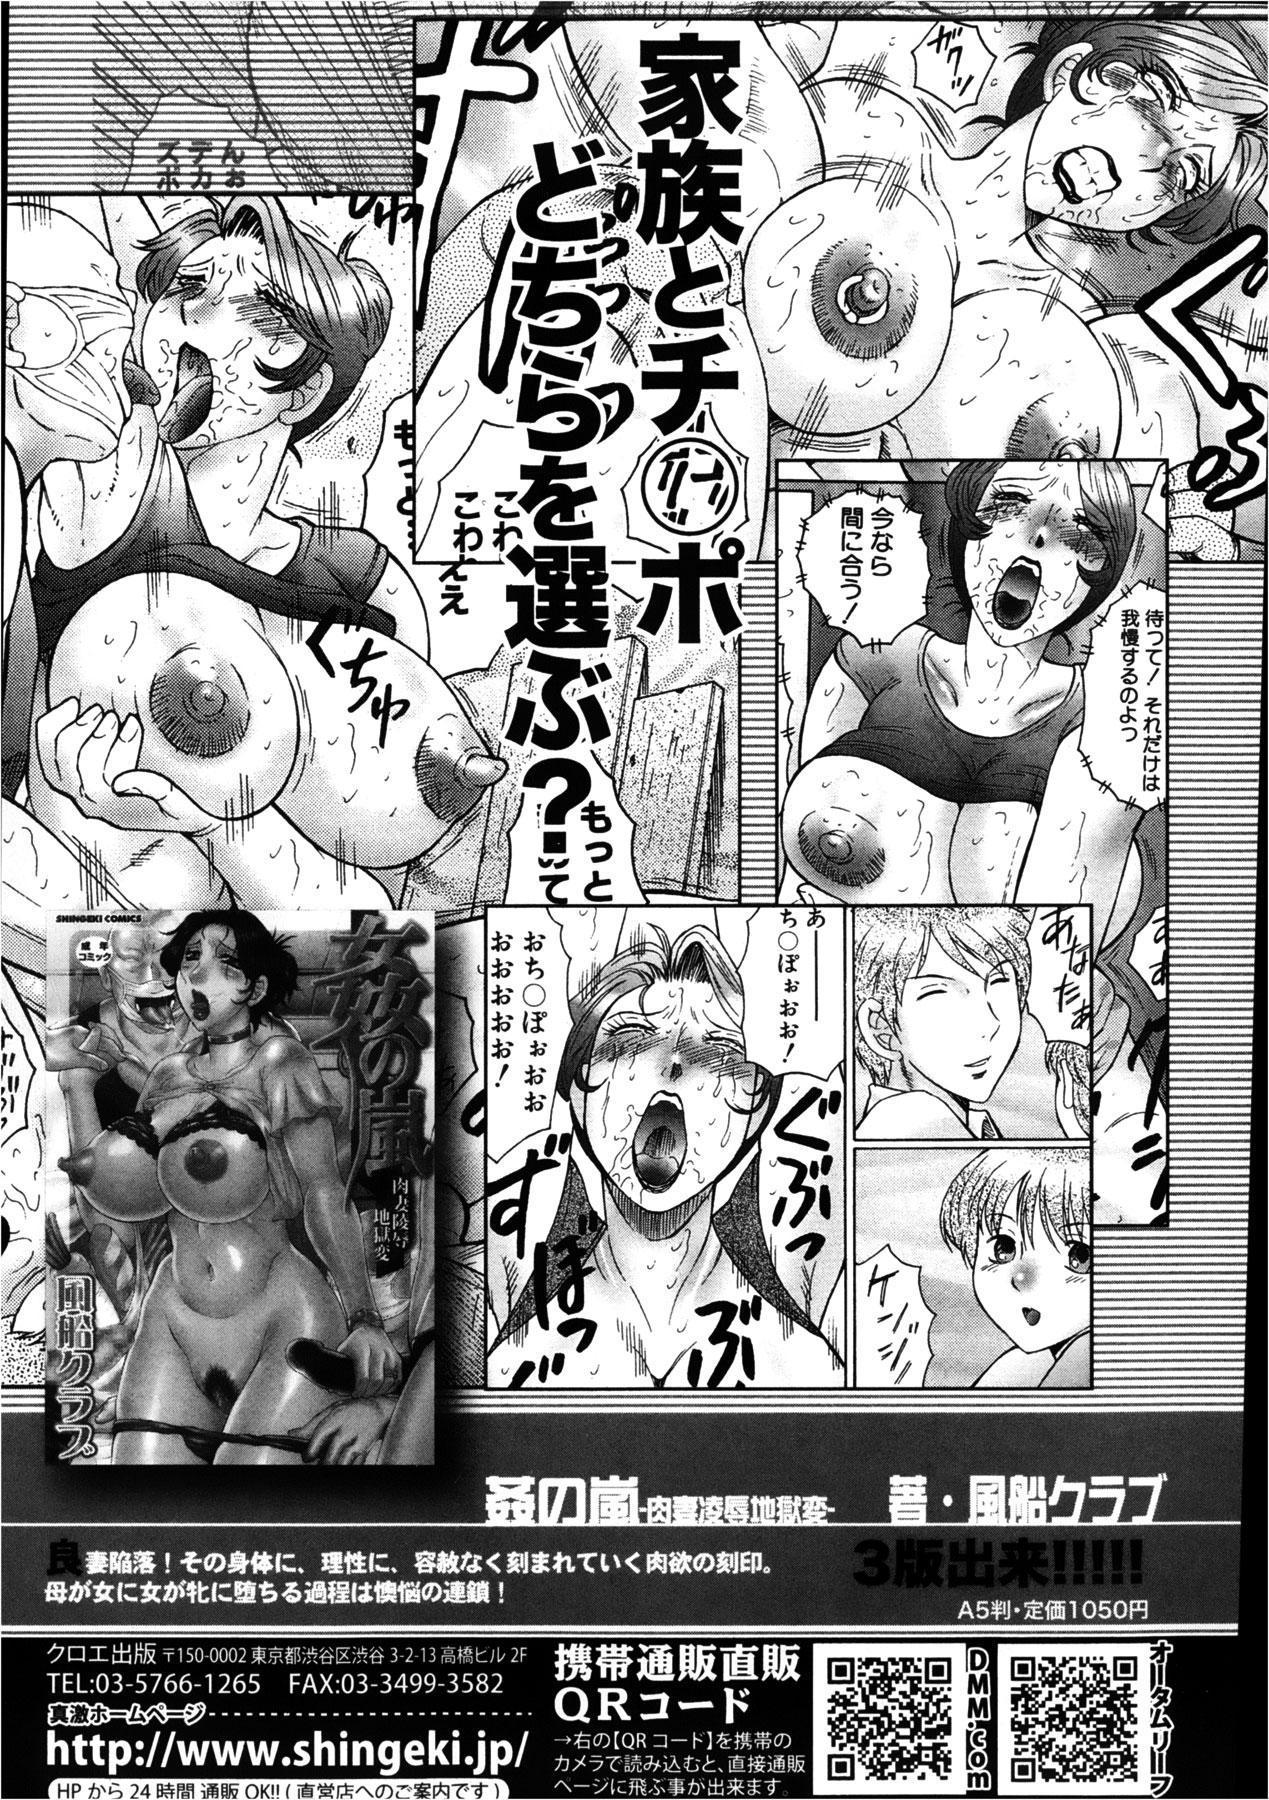 COMIC Shingeki 2013-02 342